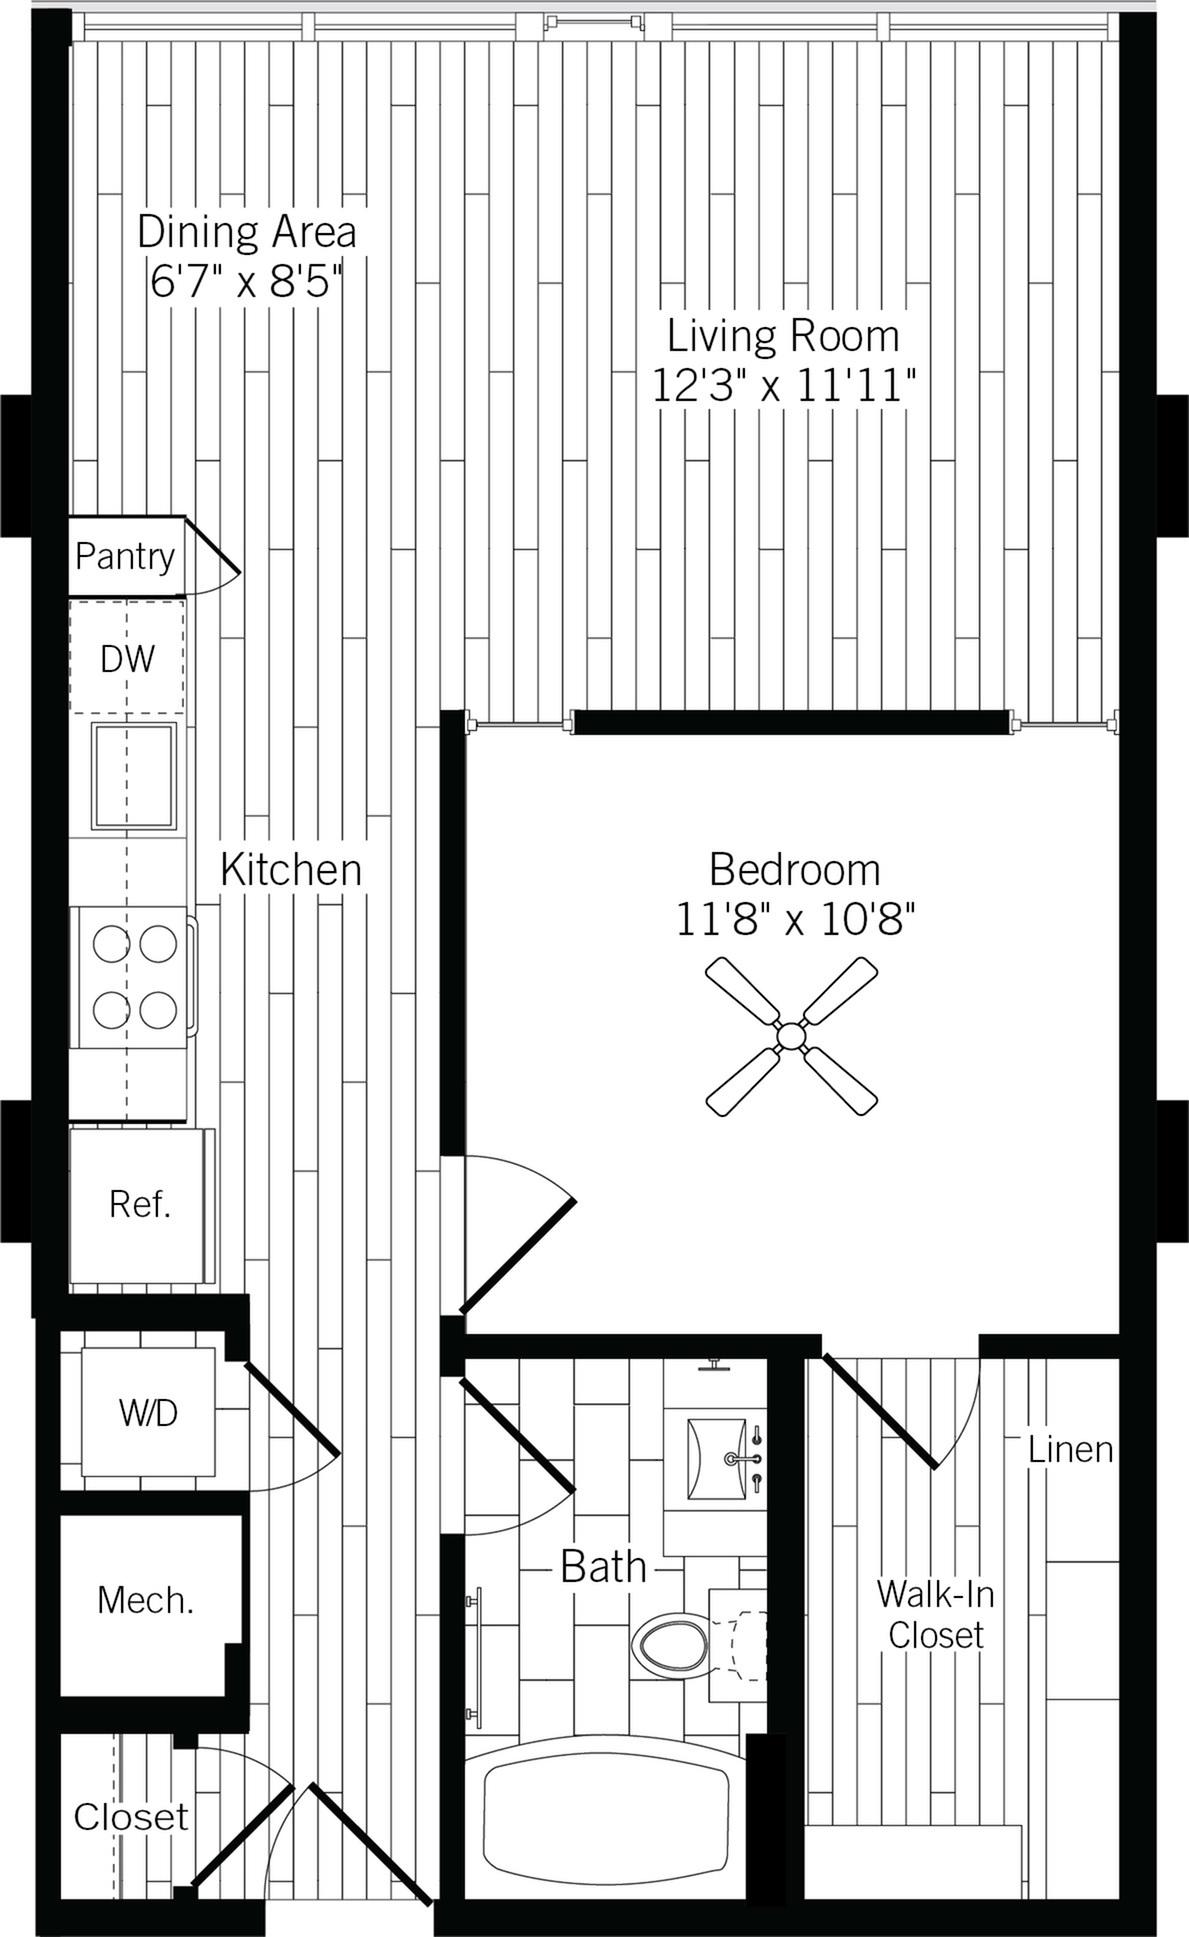 686 square foot one bedroom one bath apartment floorplan image